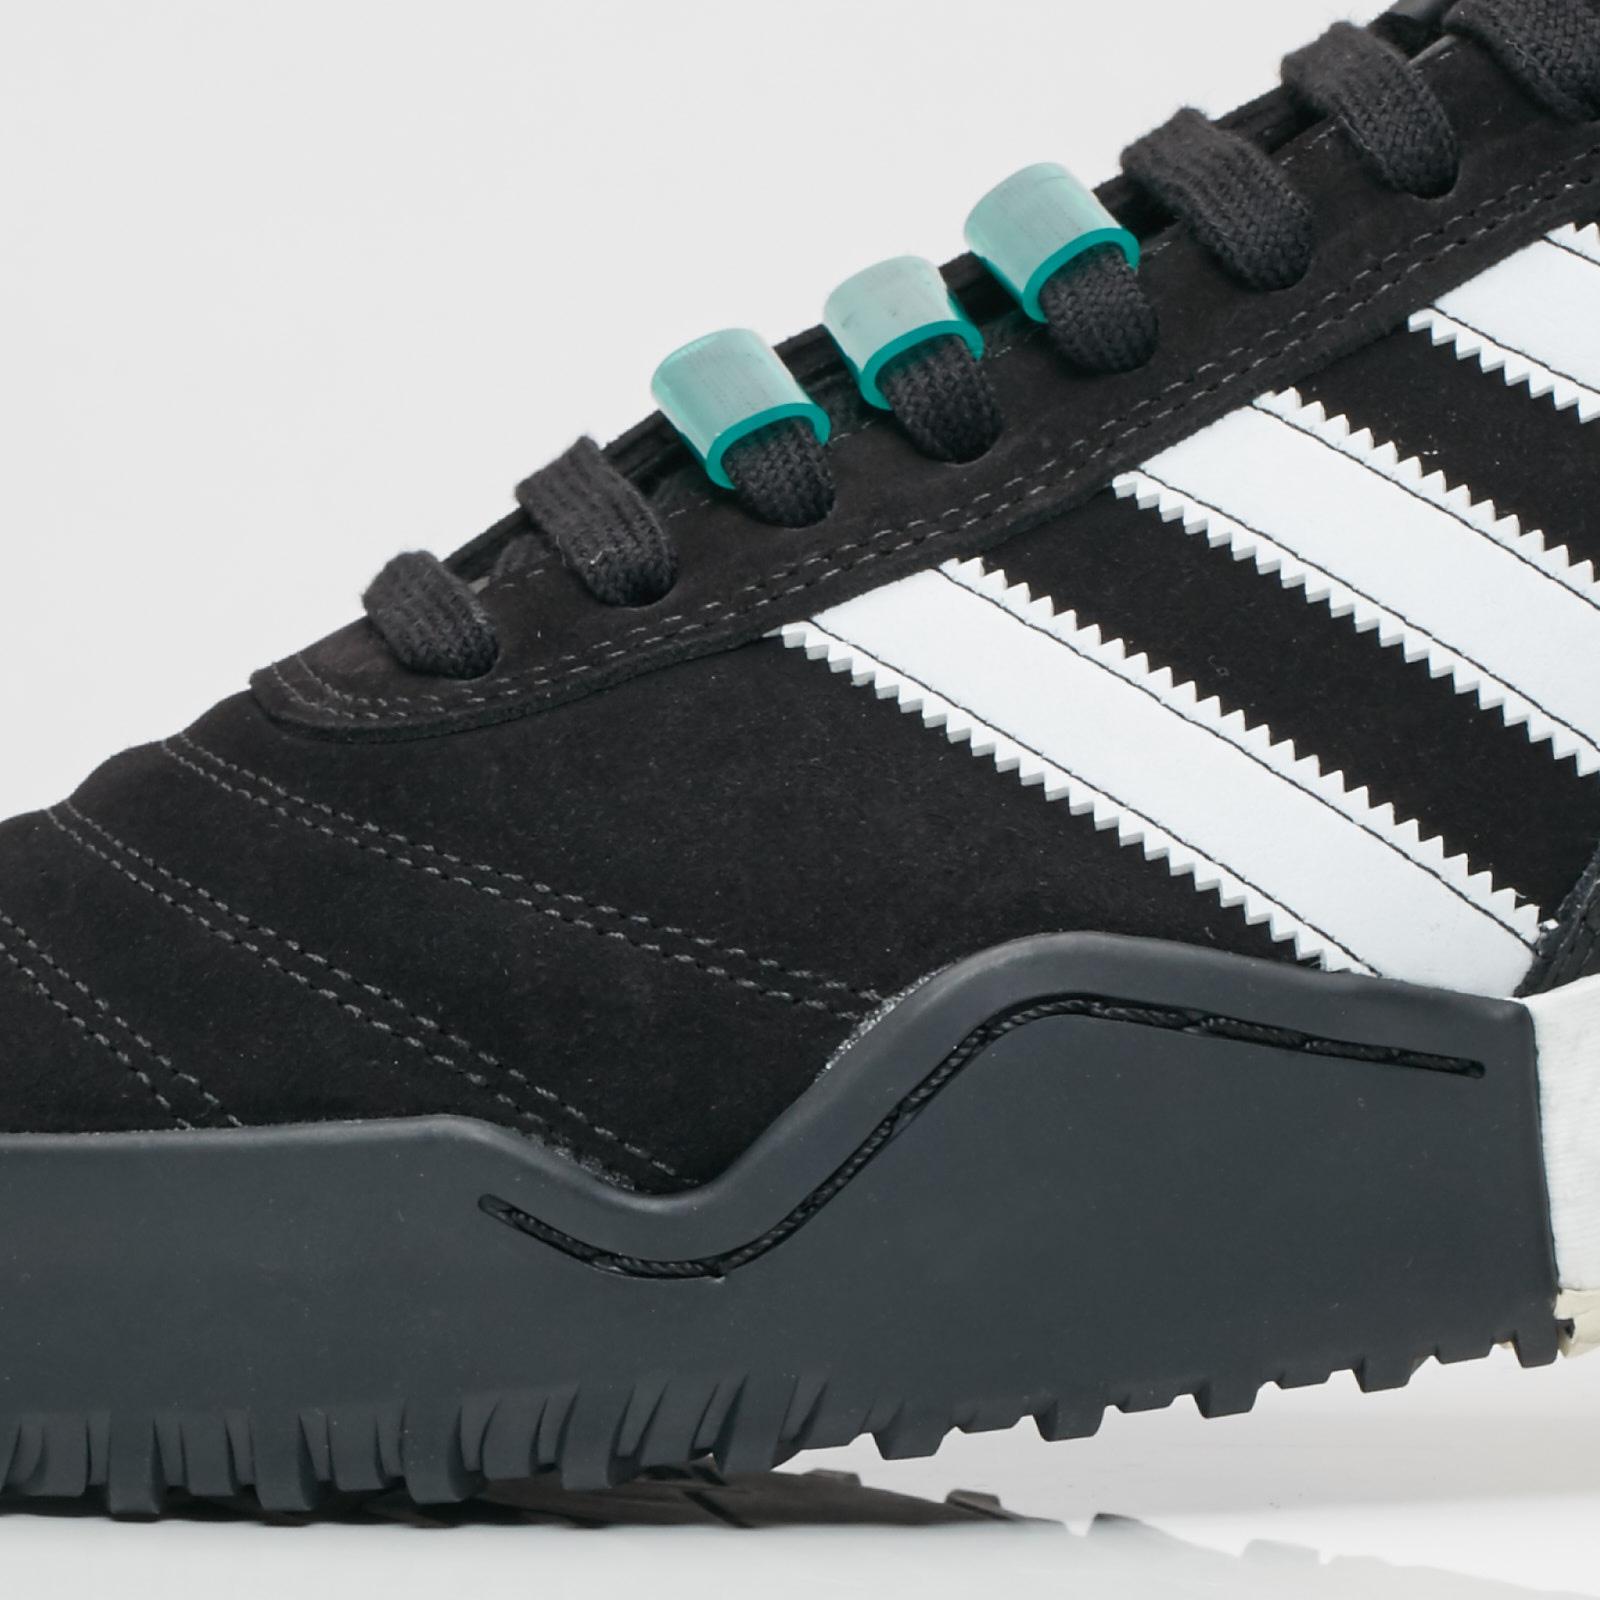 3bec23125 adidas Originals by Alexander Wang Bball Soccer - 7. Close